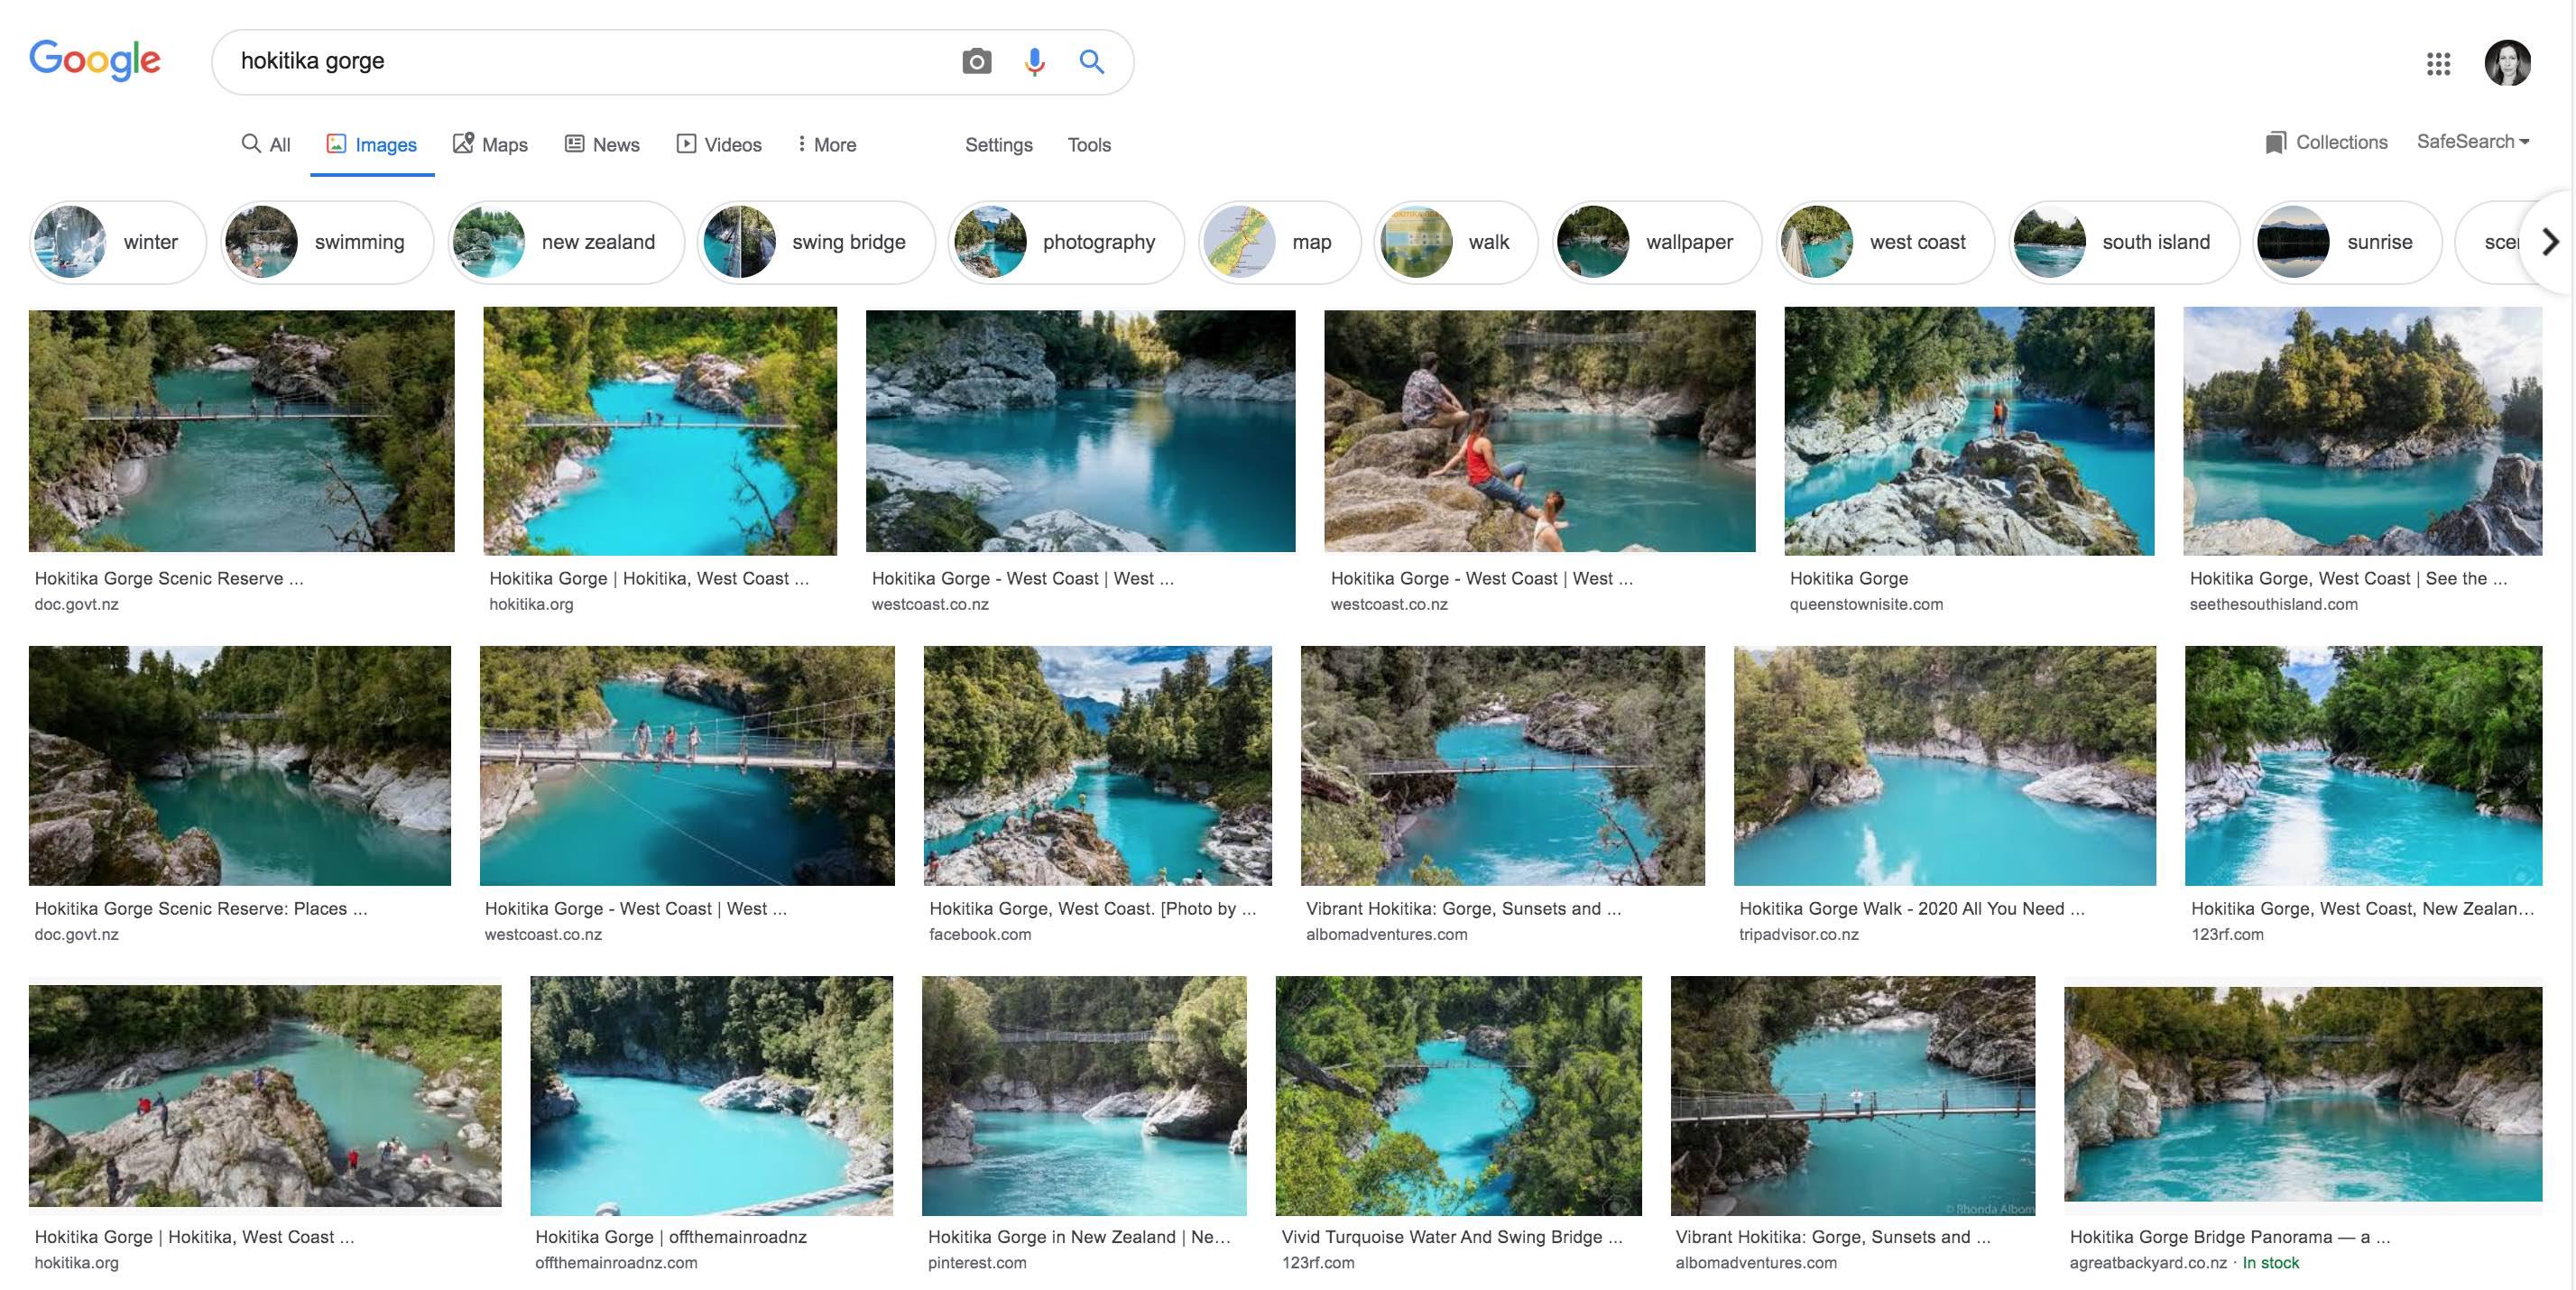 hokitika gorge google image search